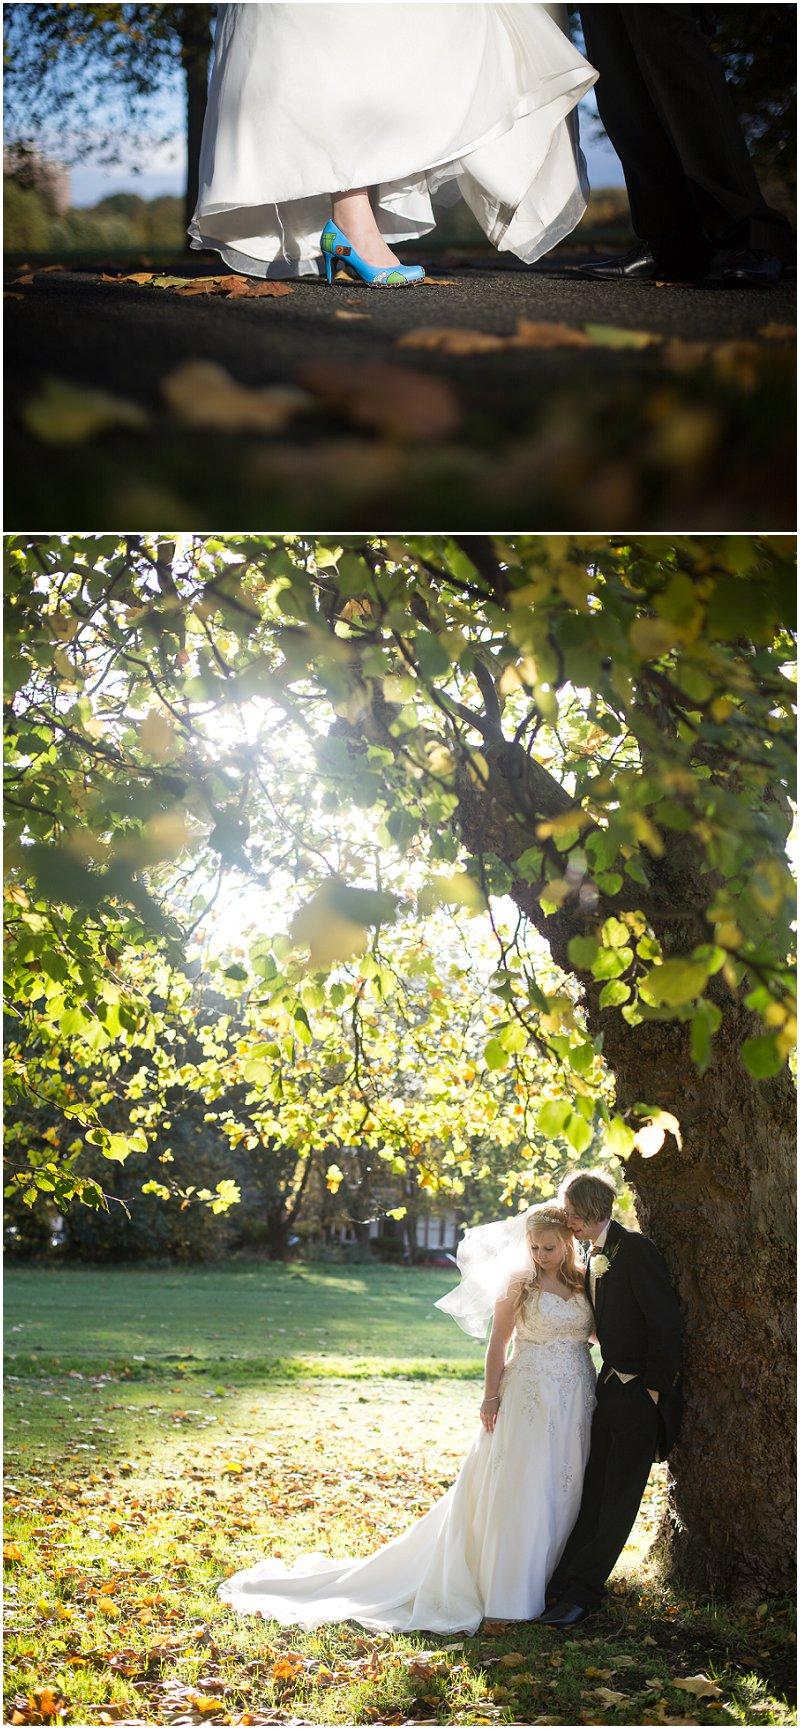 Mario Wedding Shoes | Award winning Wedding Photography Sefton Park